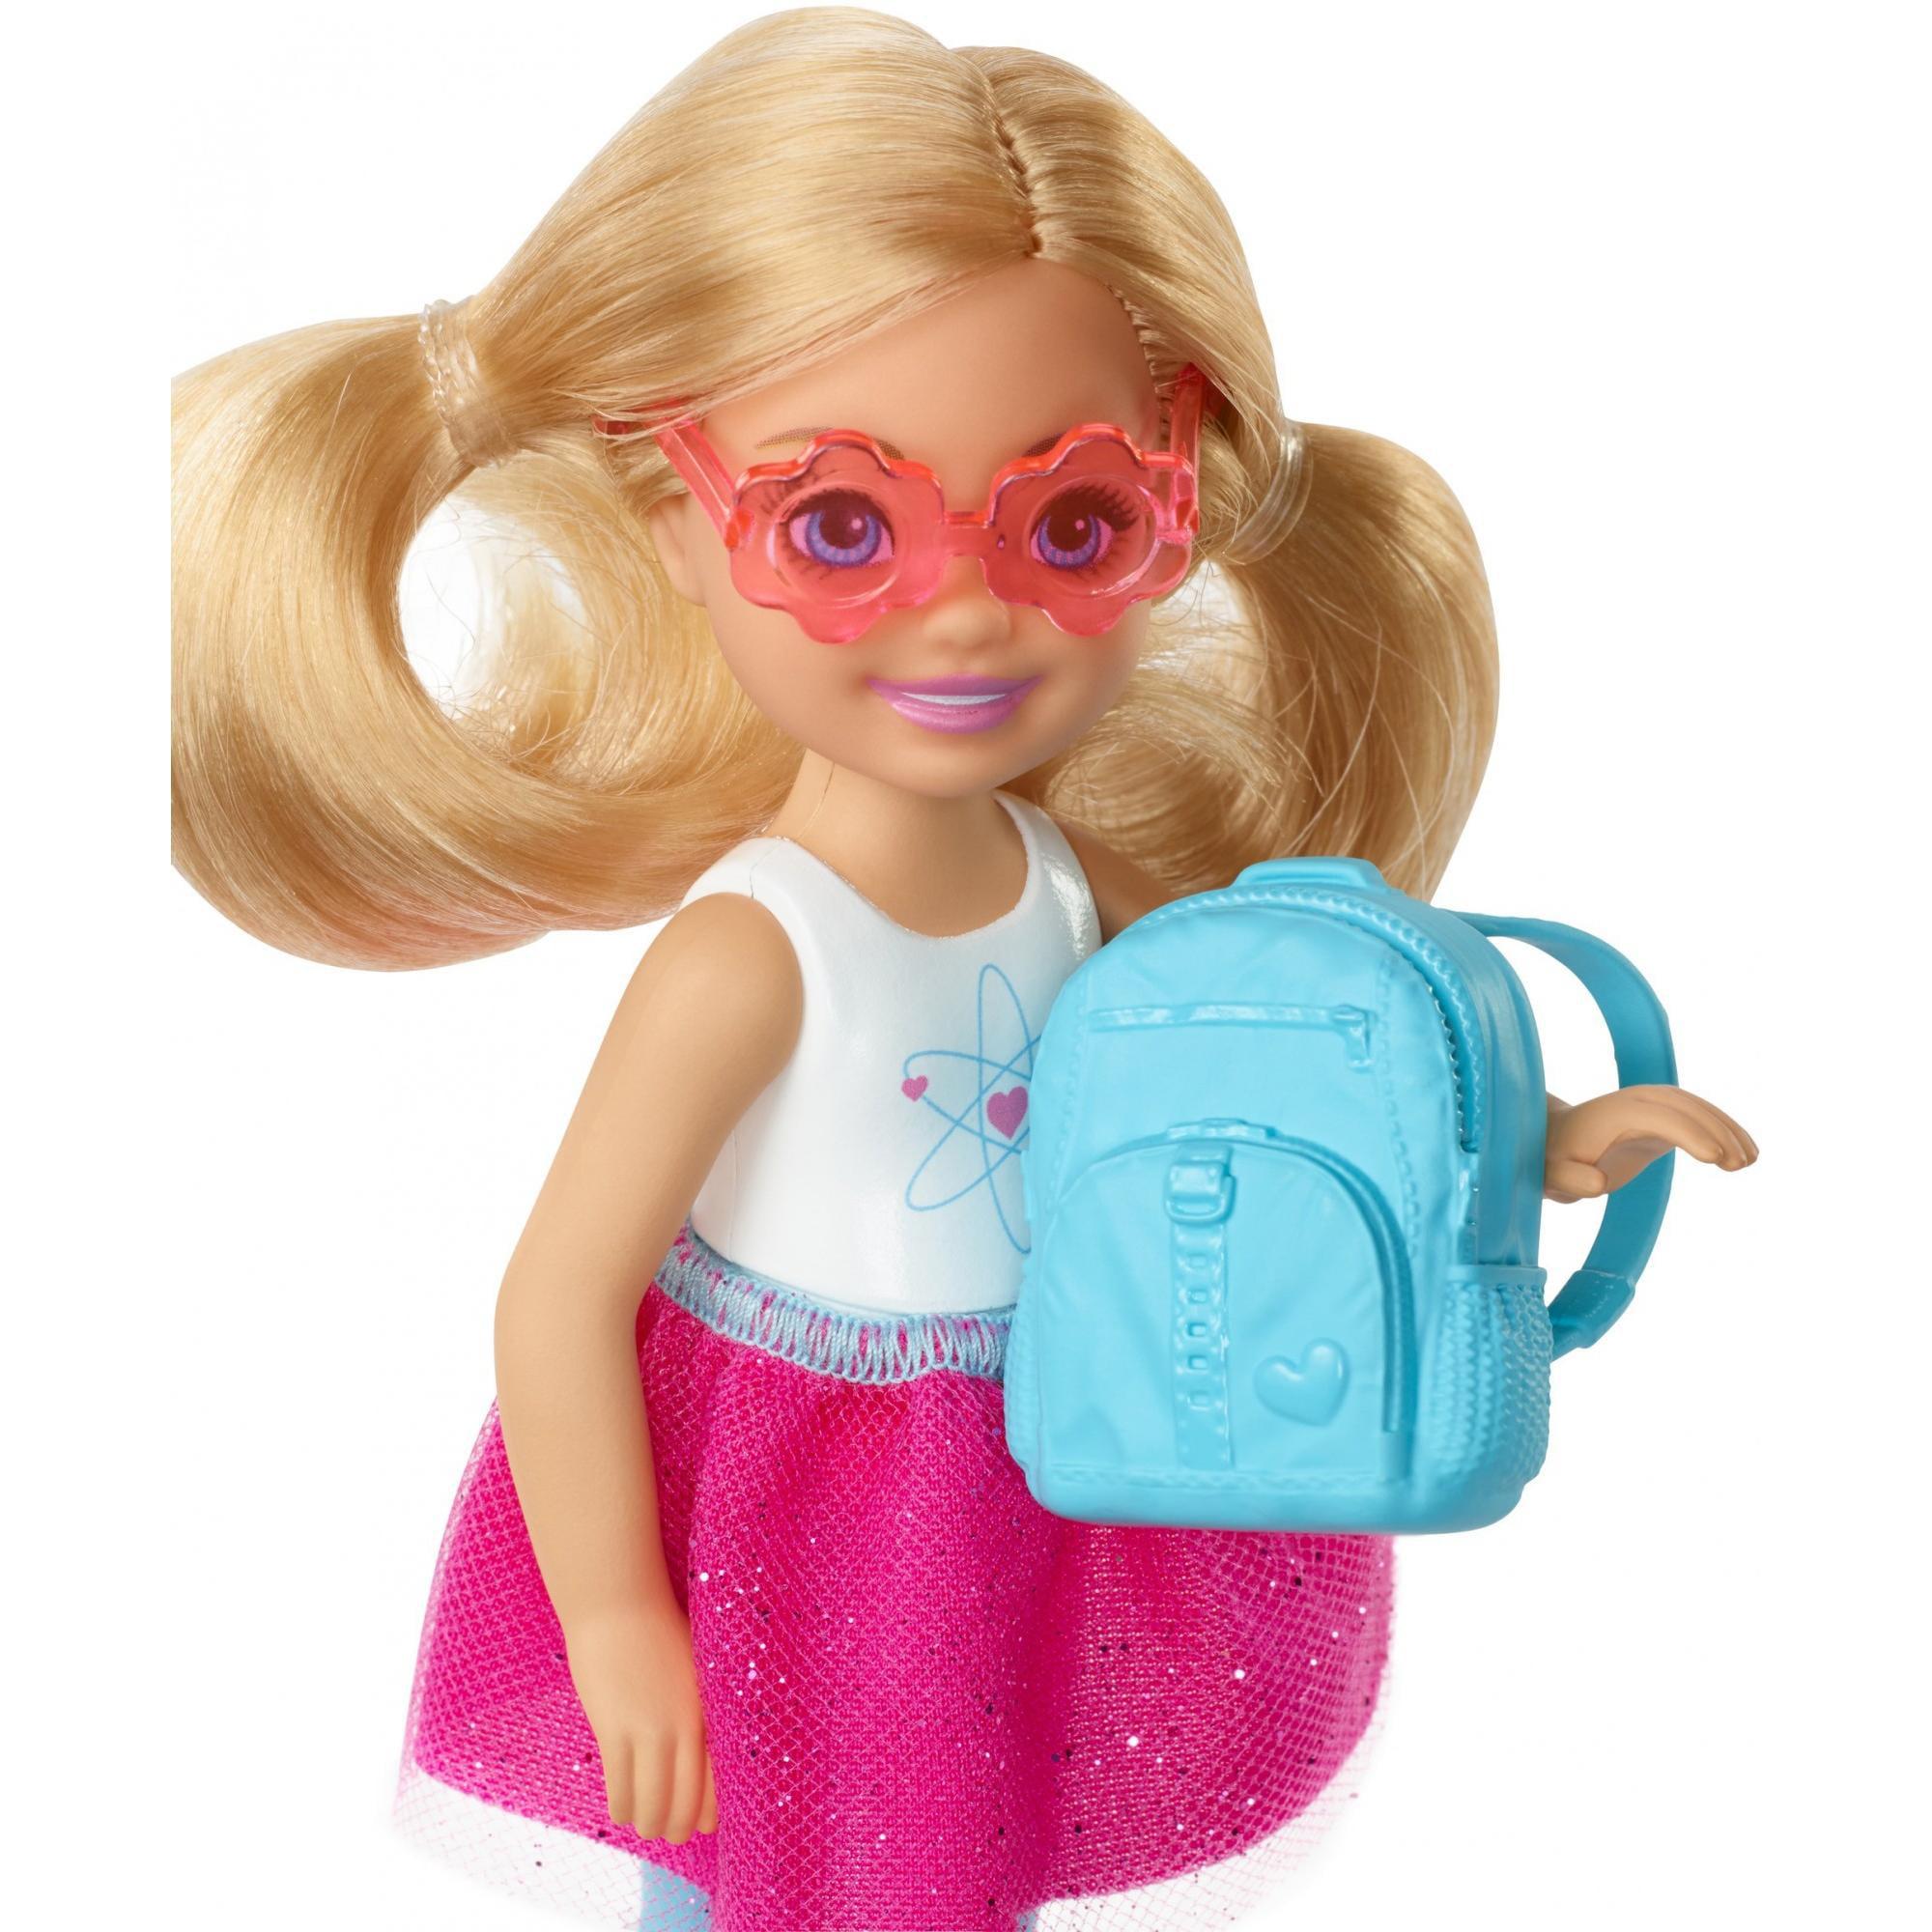 Barbie Chelsea Doll Travel Set With Puppy Accessories Walmart Com Walmart Com